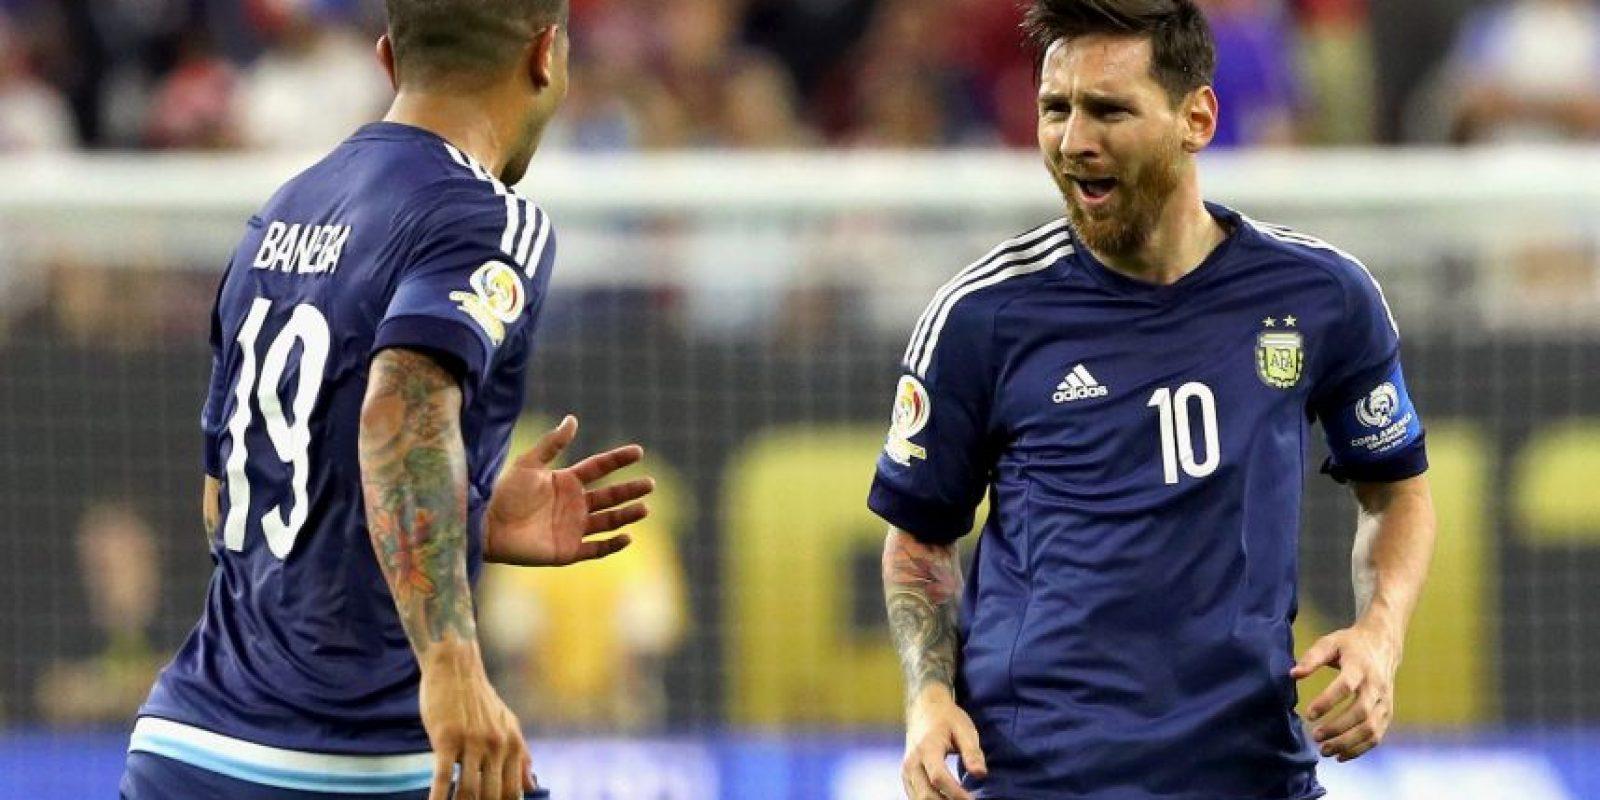 Argentina llega a la final tras vencer a Estados Unidos por 4 a 0 en la semifinal Foto:Getty Images